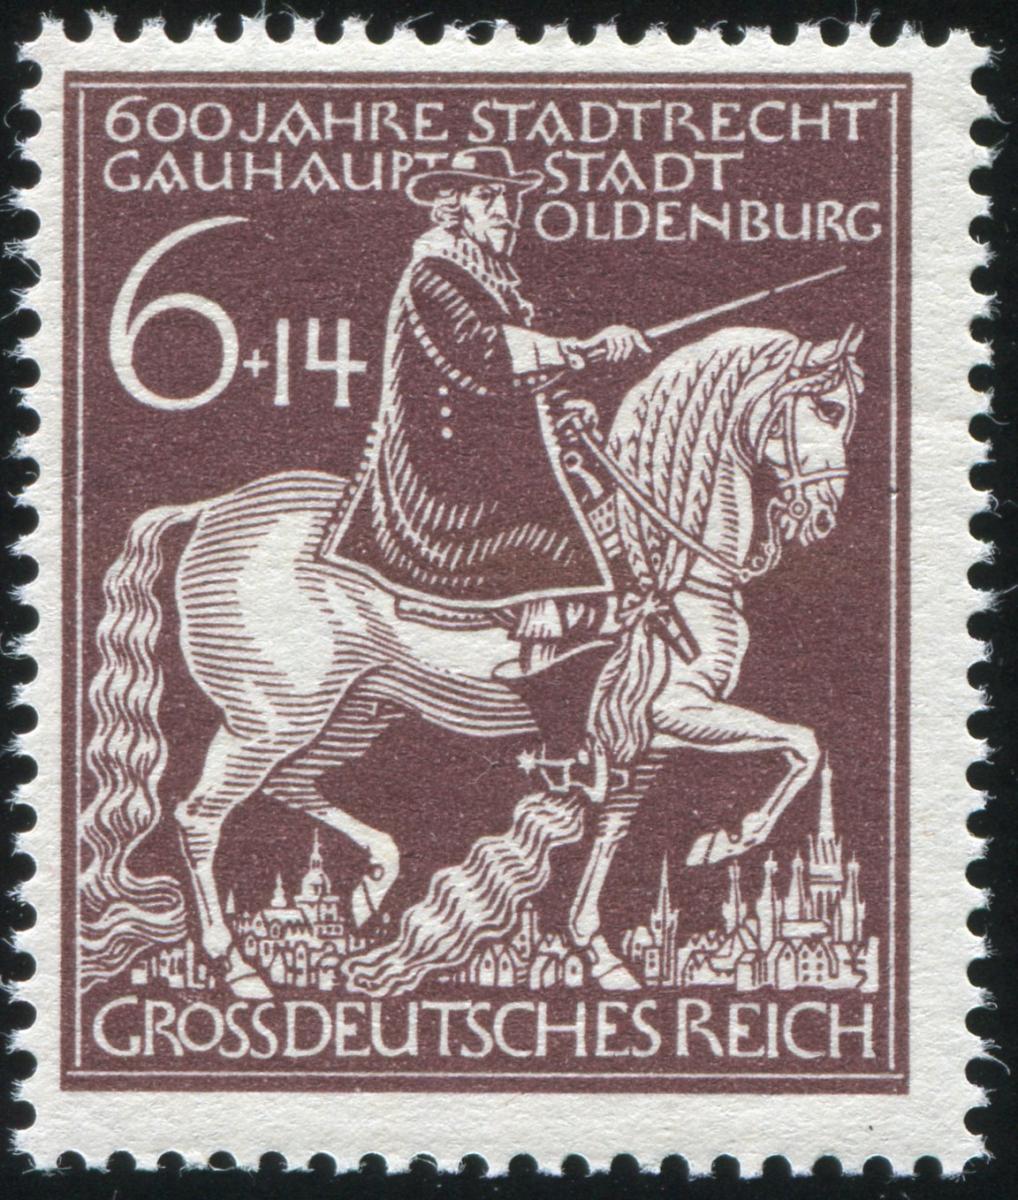 907IV Oldenburg 1945: gebrochenes Schwert, Feld 18, ** 0